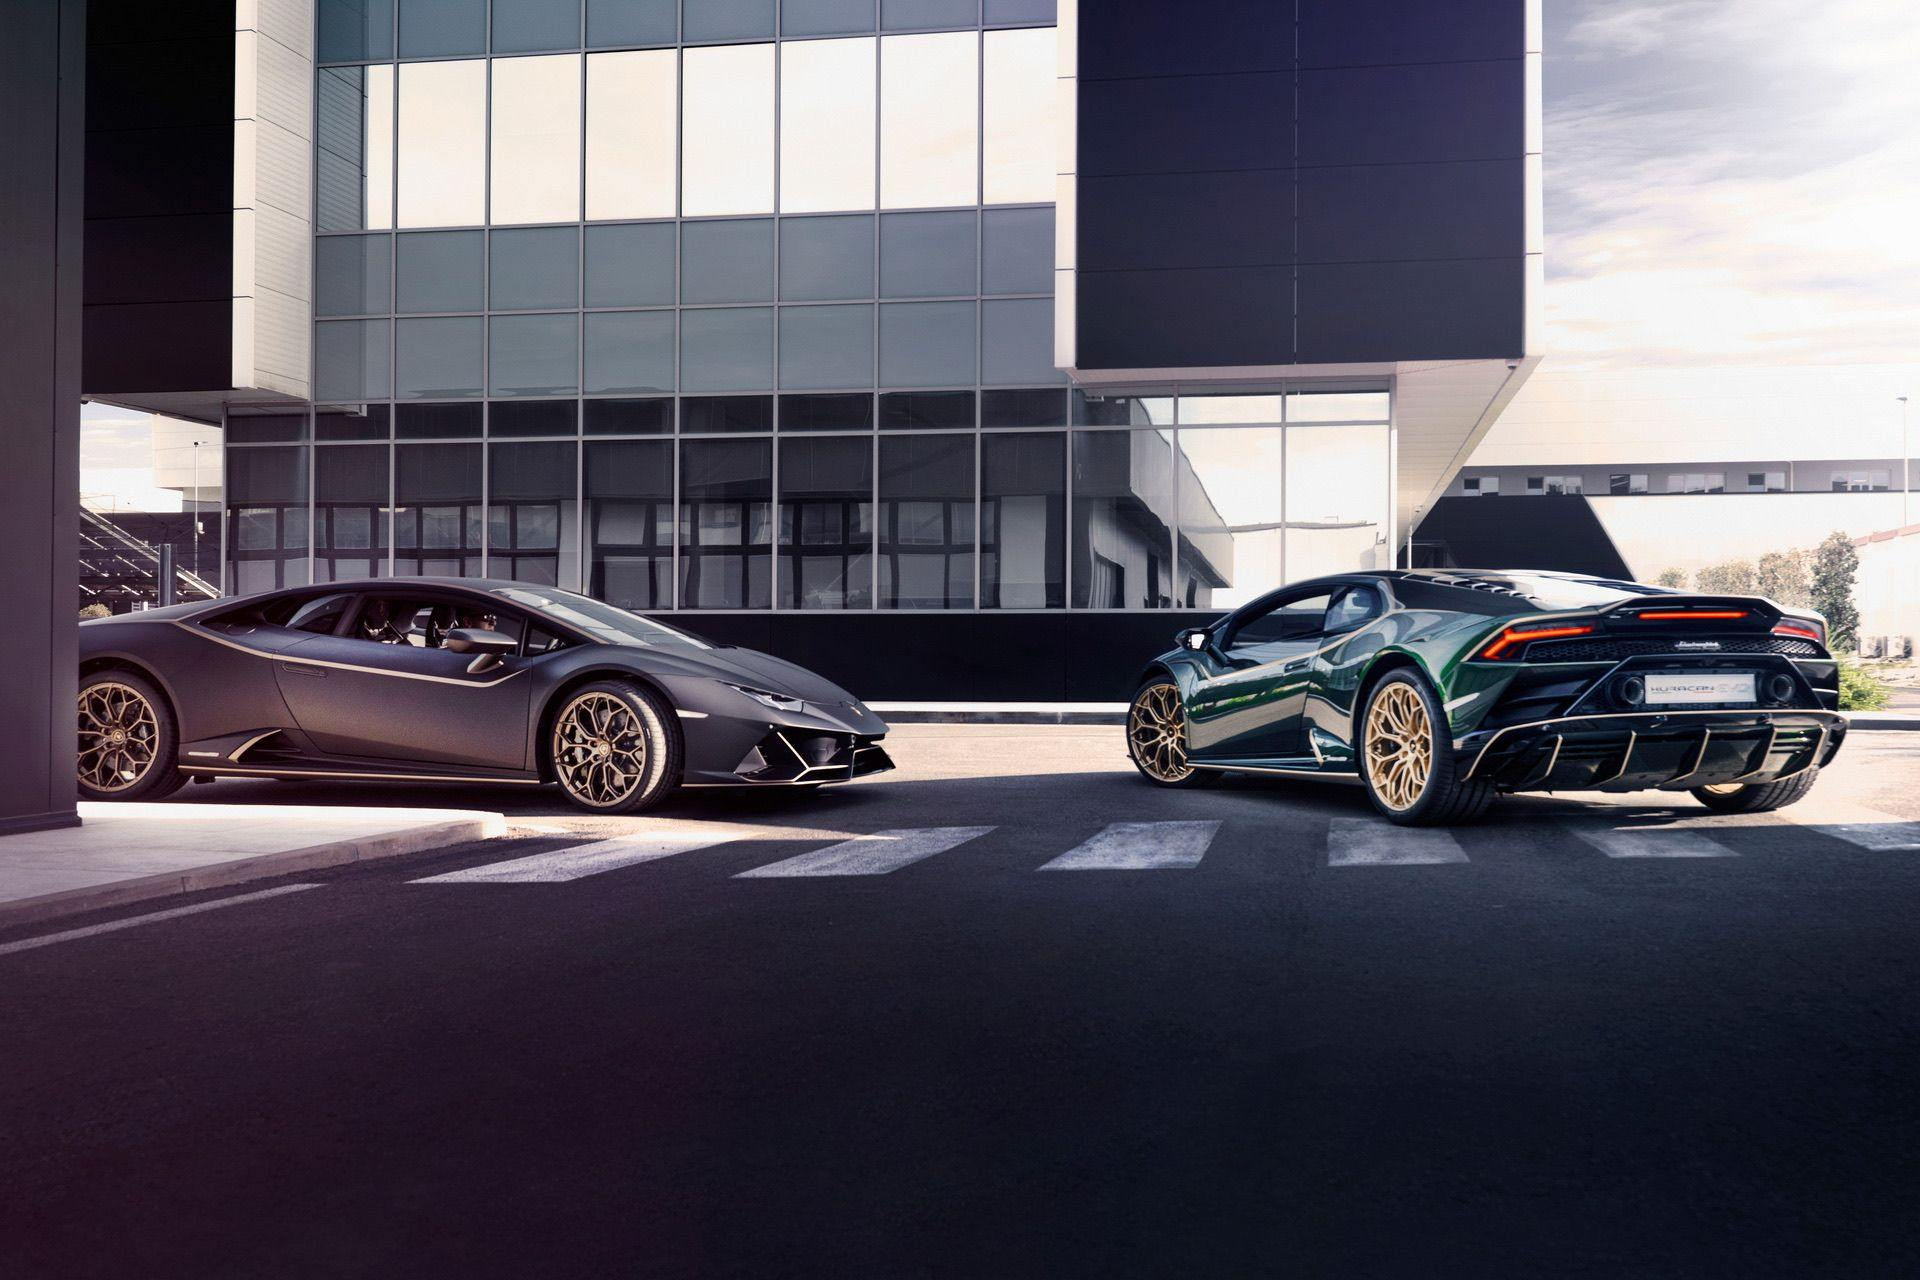 Lamborghini-Huracan-for-Mexico17_1920x1280